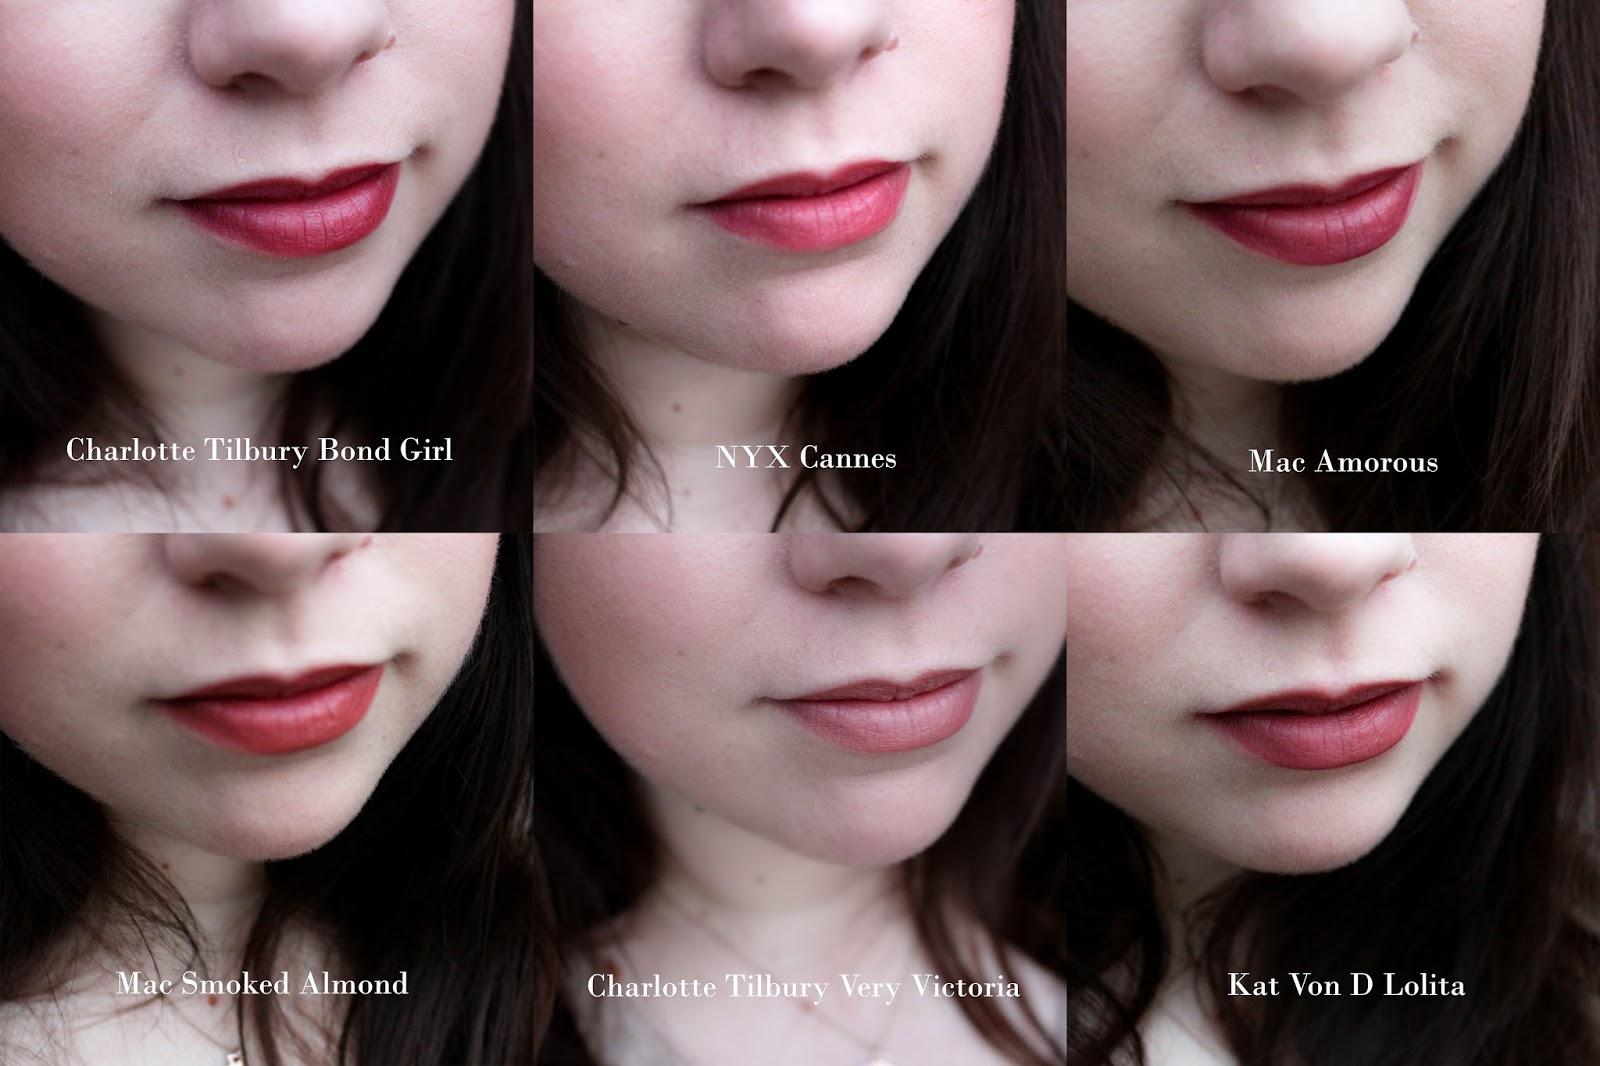 Charlotte TIlbury Bond Girl, Charlotte TIlbury Very Victoria, MAC Amorous, MAC Smoked Almond, Kat Von D Lolita